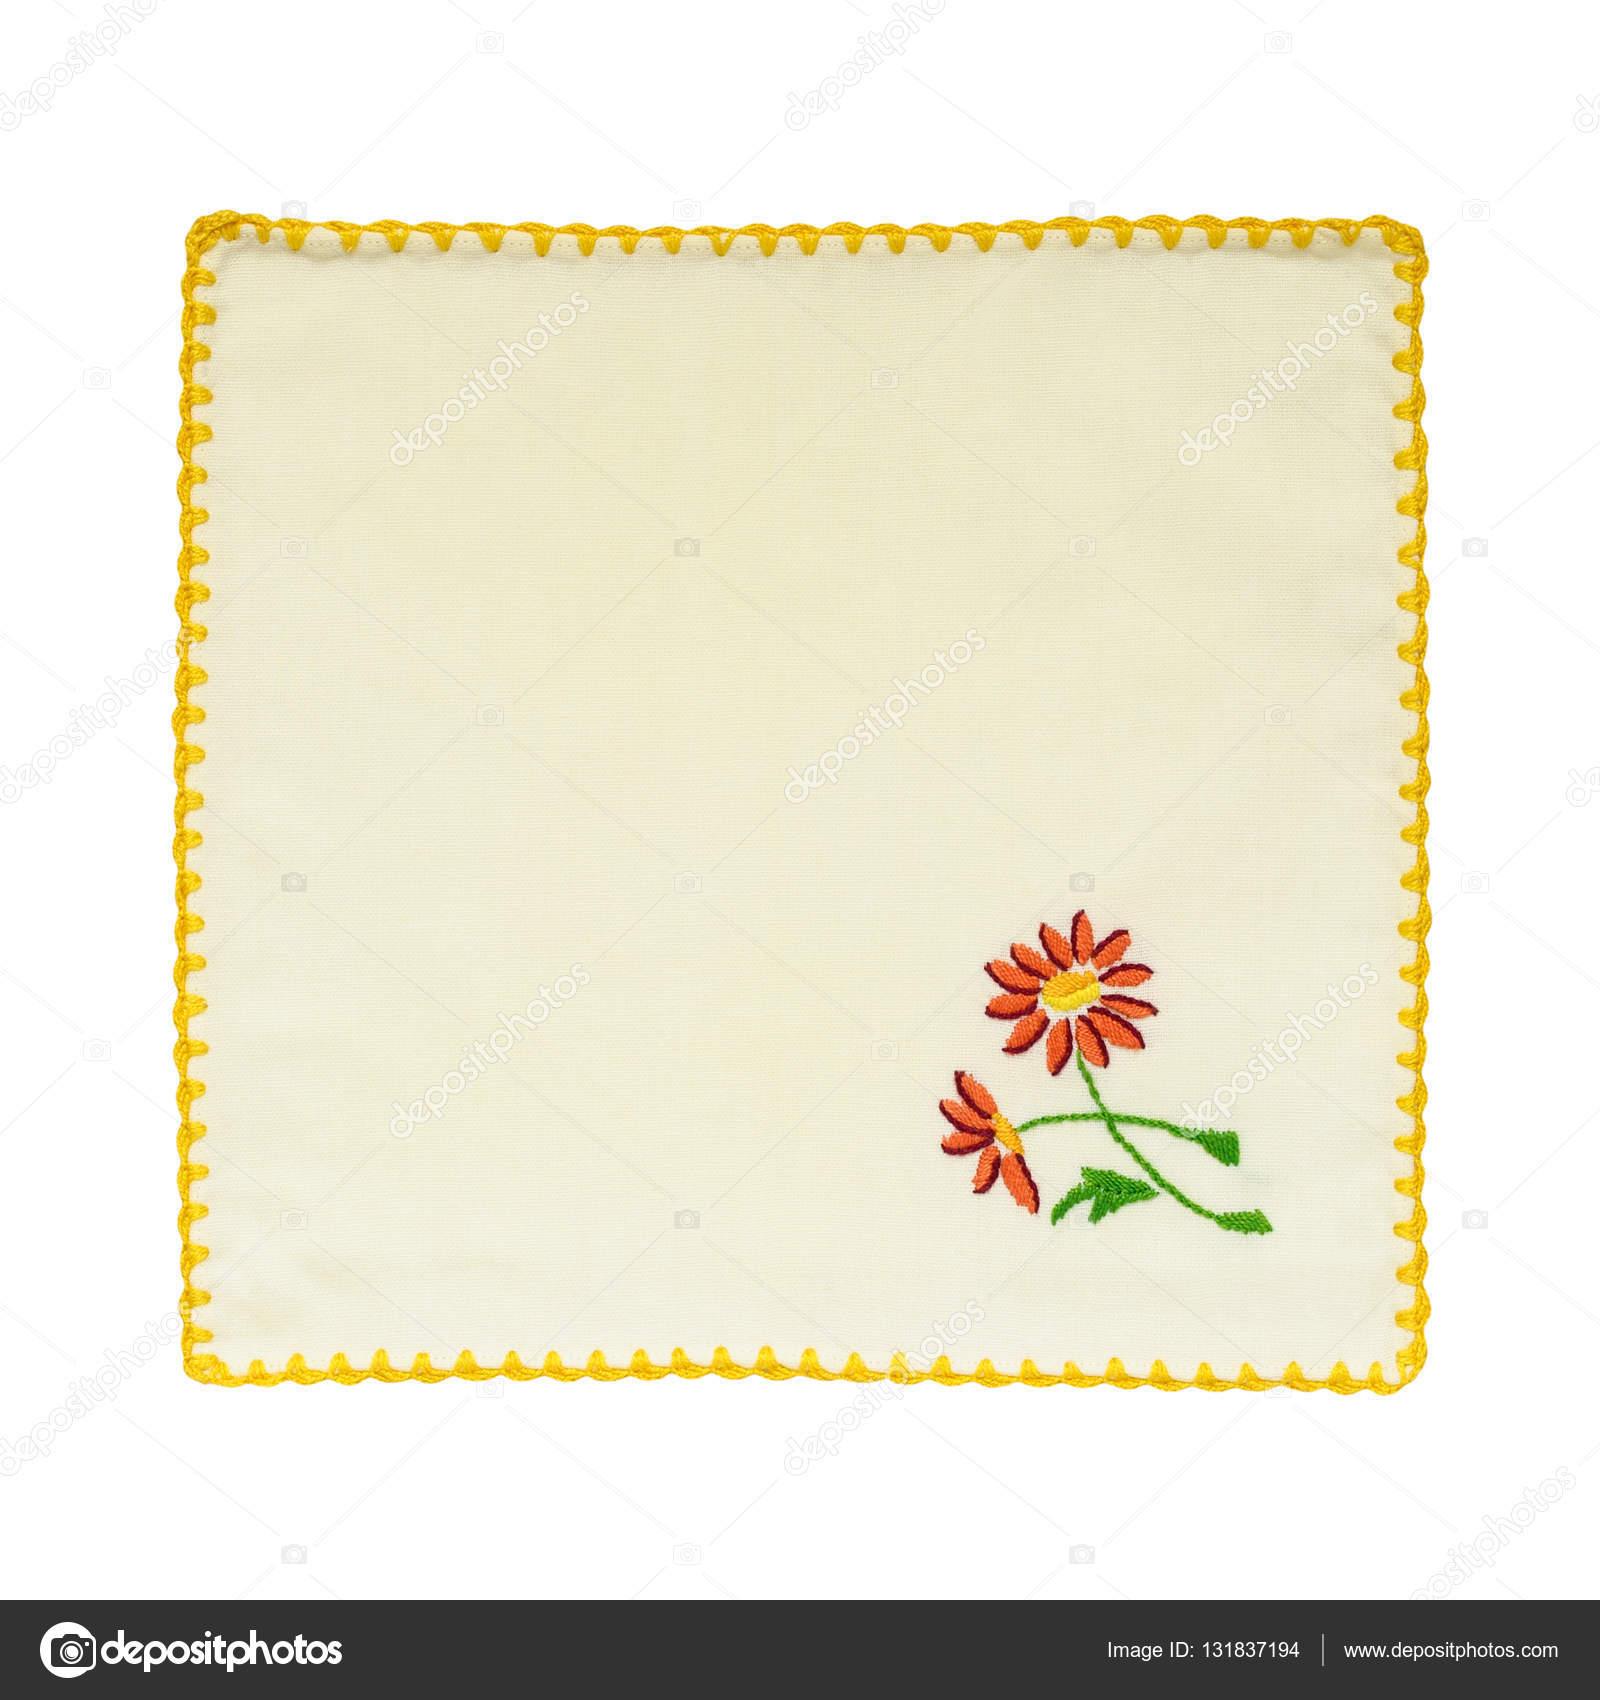 Mantel bordado Húngaro — Foto de stock © Vonschonertagen #131837194